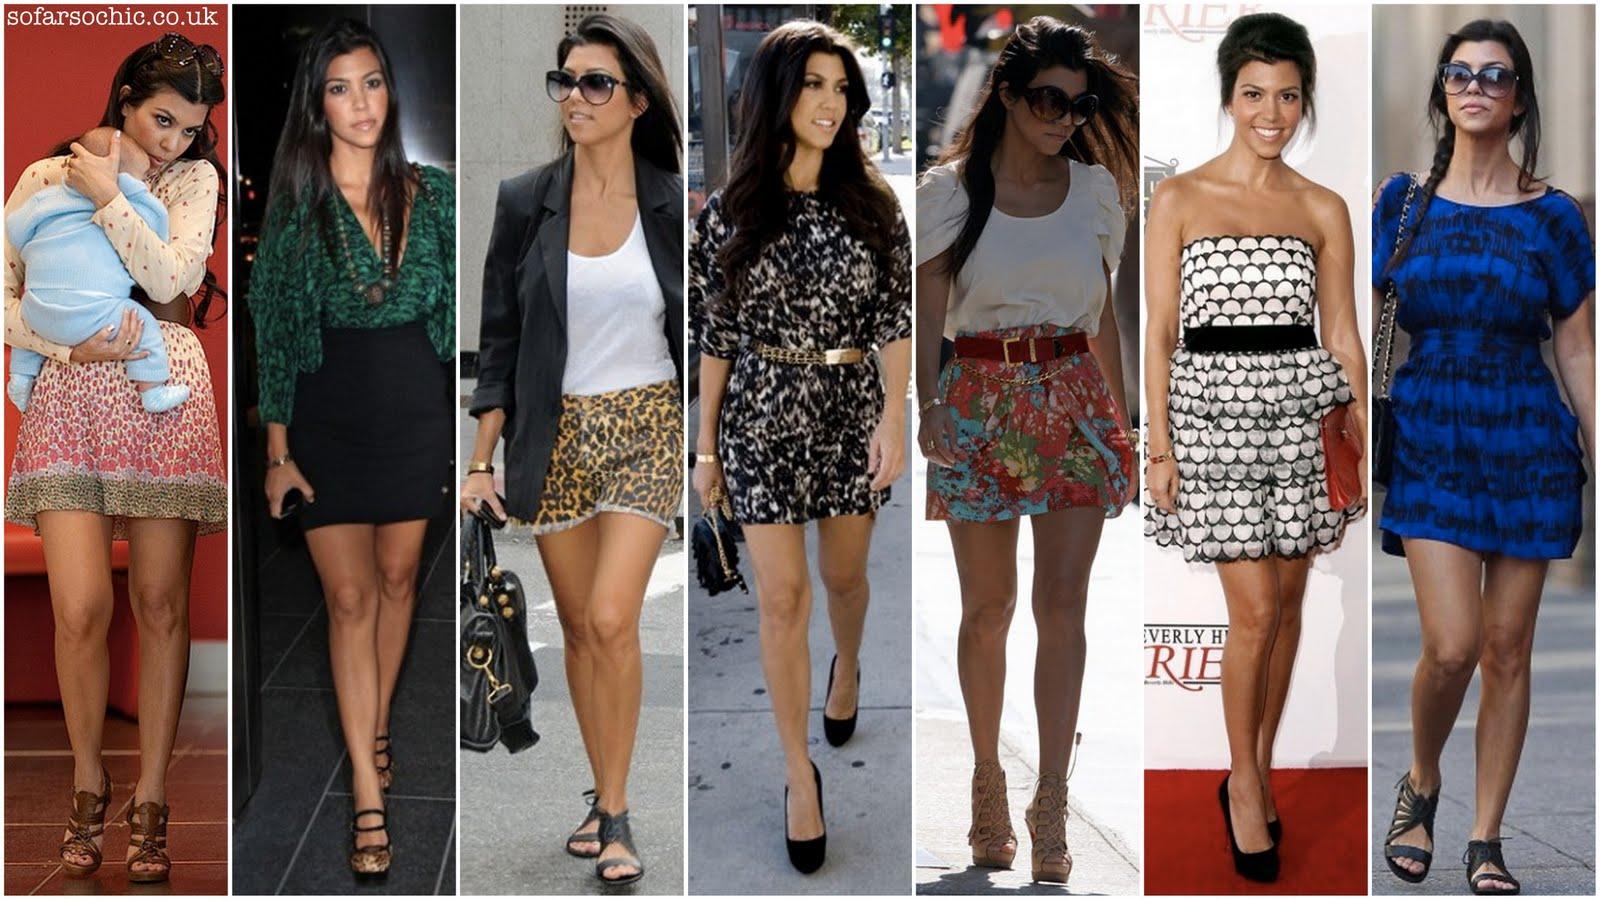 My Fashion Muse Kourtney Kardashian Tukang Celoteh